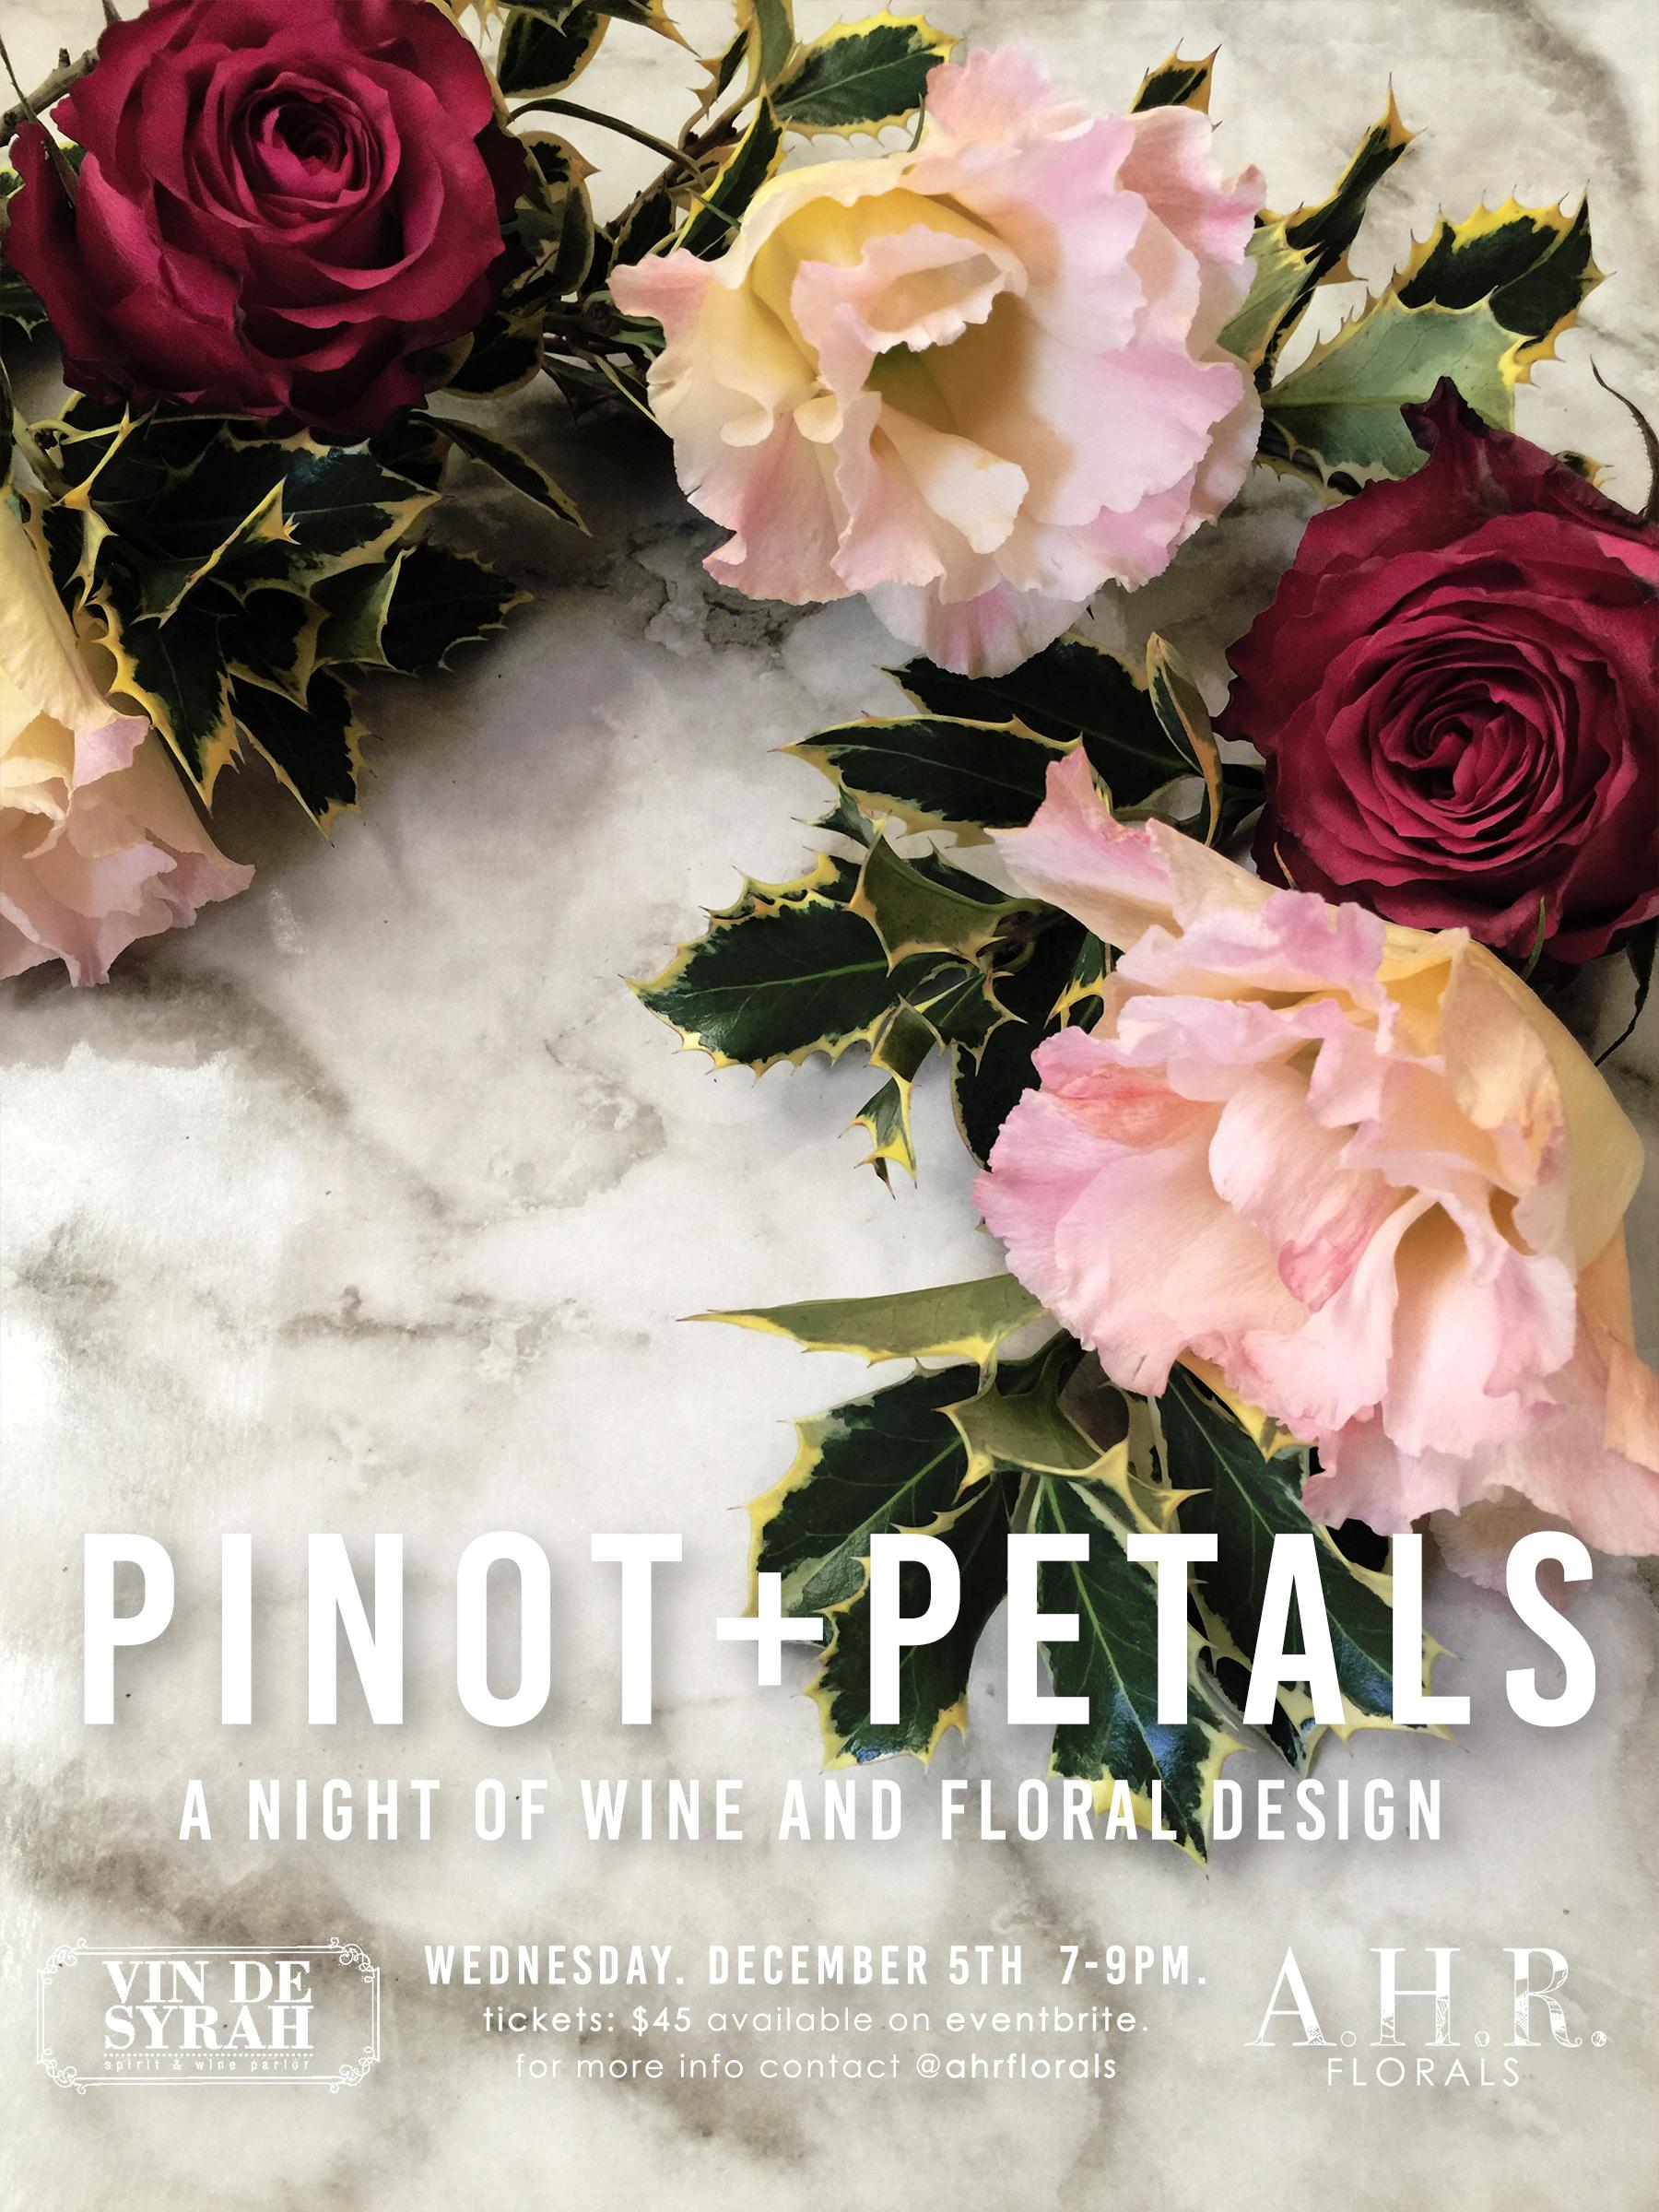 AHR FLORALS PINOT+PETALS Holiday Wreaths